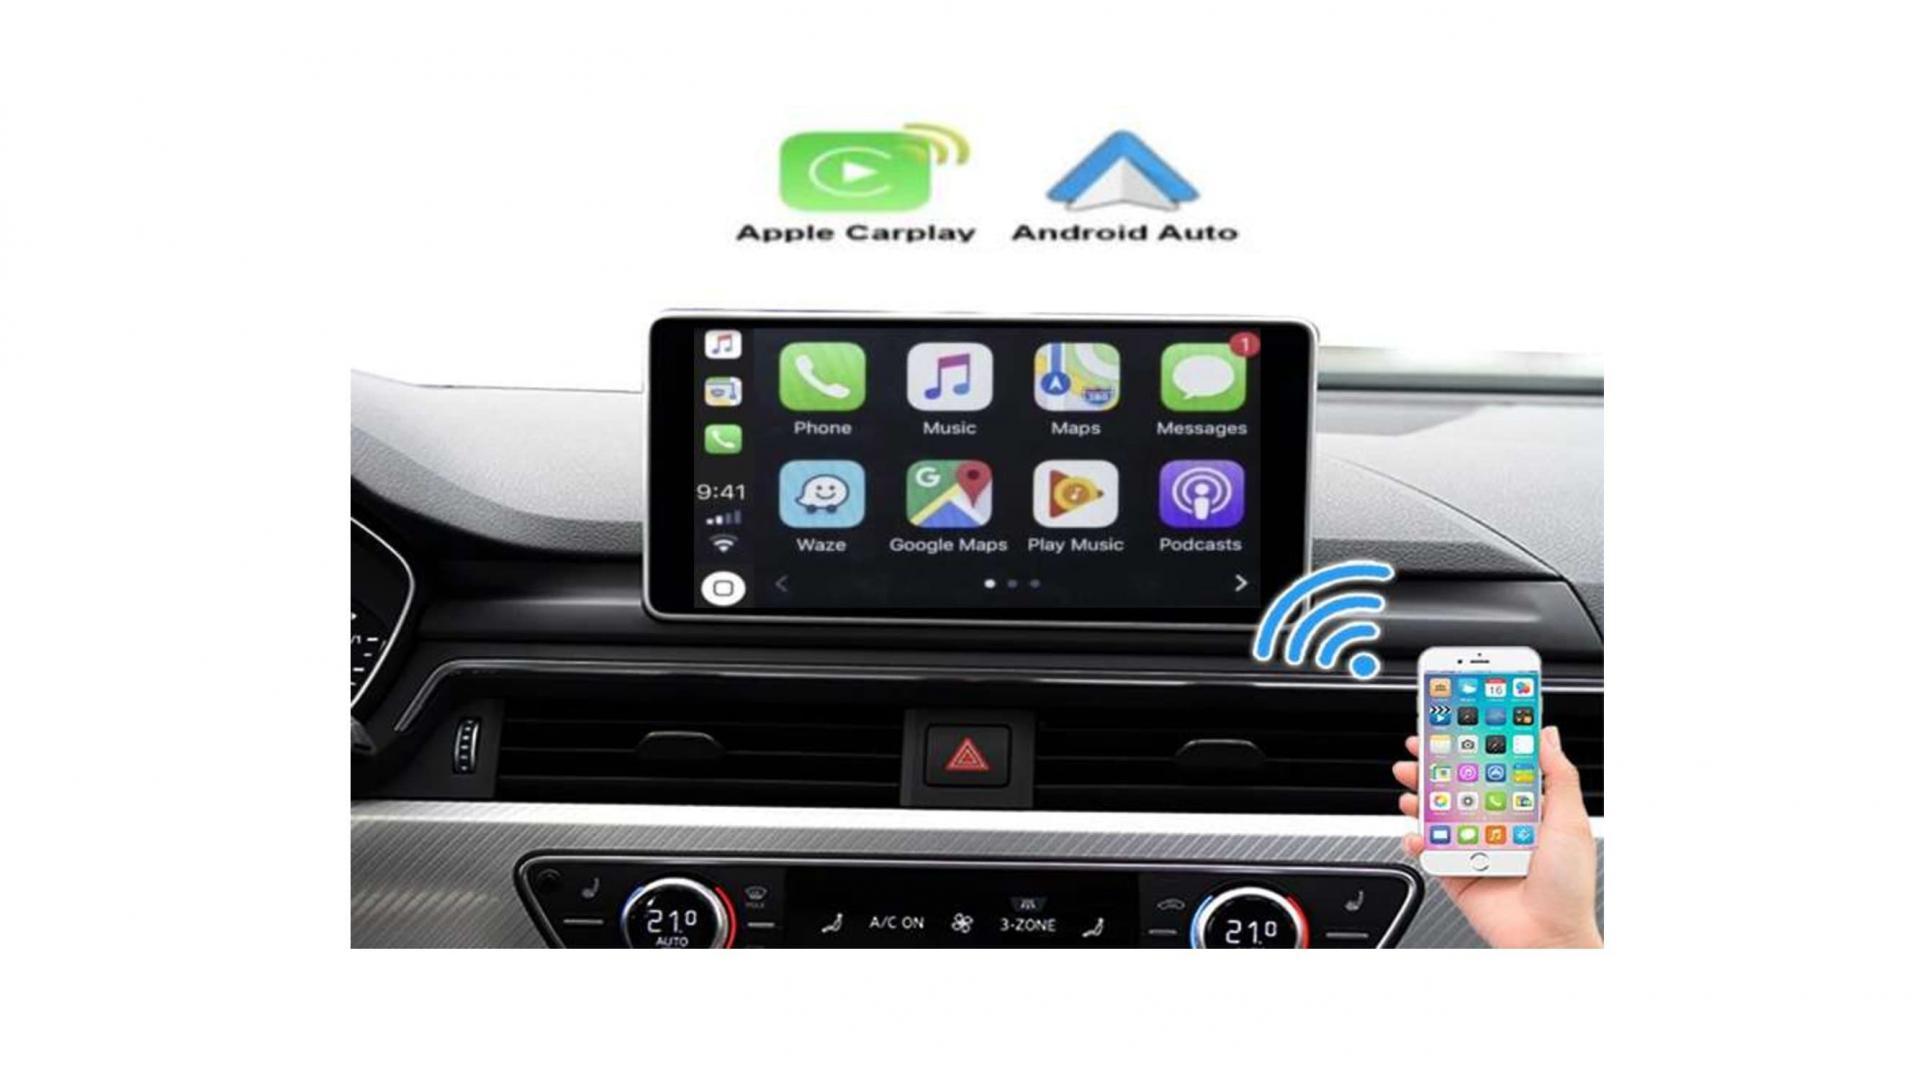 Bmw e70 e71 f20 f23 21 7 f06 f12 g11 x3 f25 x4carplay android auto gps autoradio i3 x3 m3 m5 x1 f48 x2 f39 2010 2011 2012 2013 2014 2015 2016 2017 2018 2019 e84 x5 x6 serie 1 serie